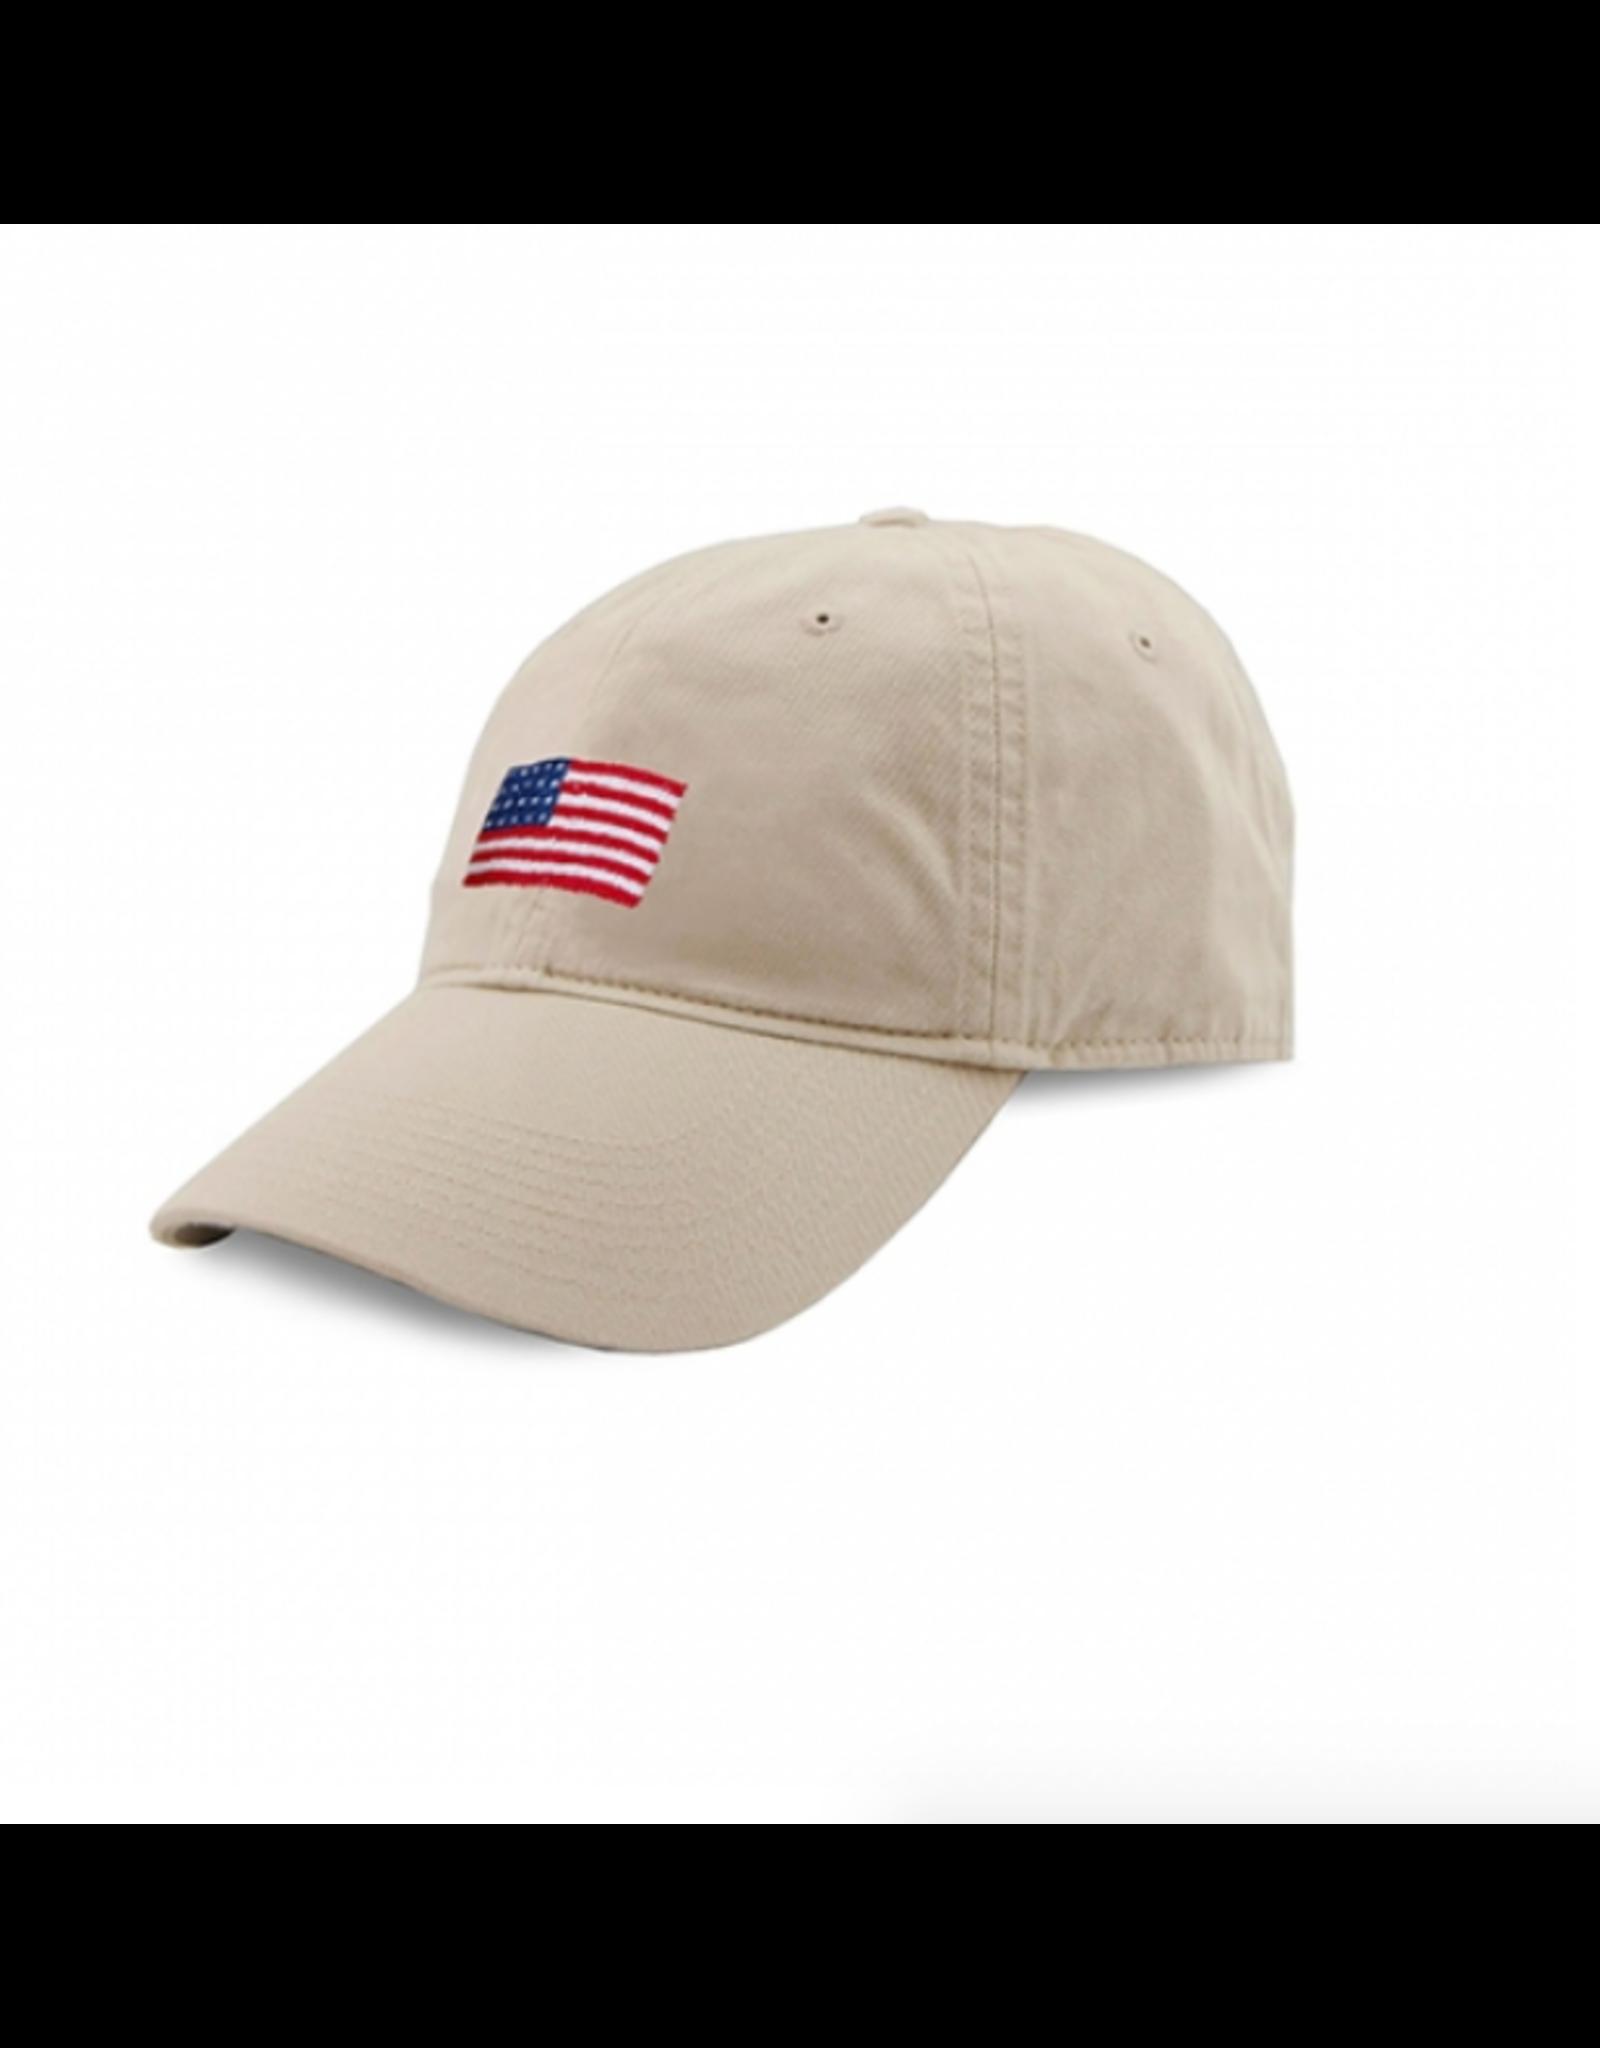 Smathers & Branson S&B Needlepoint Ball Hat, American Flag on Stone